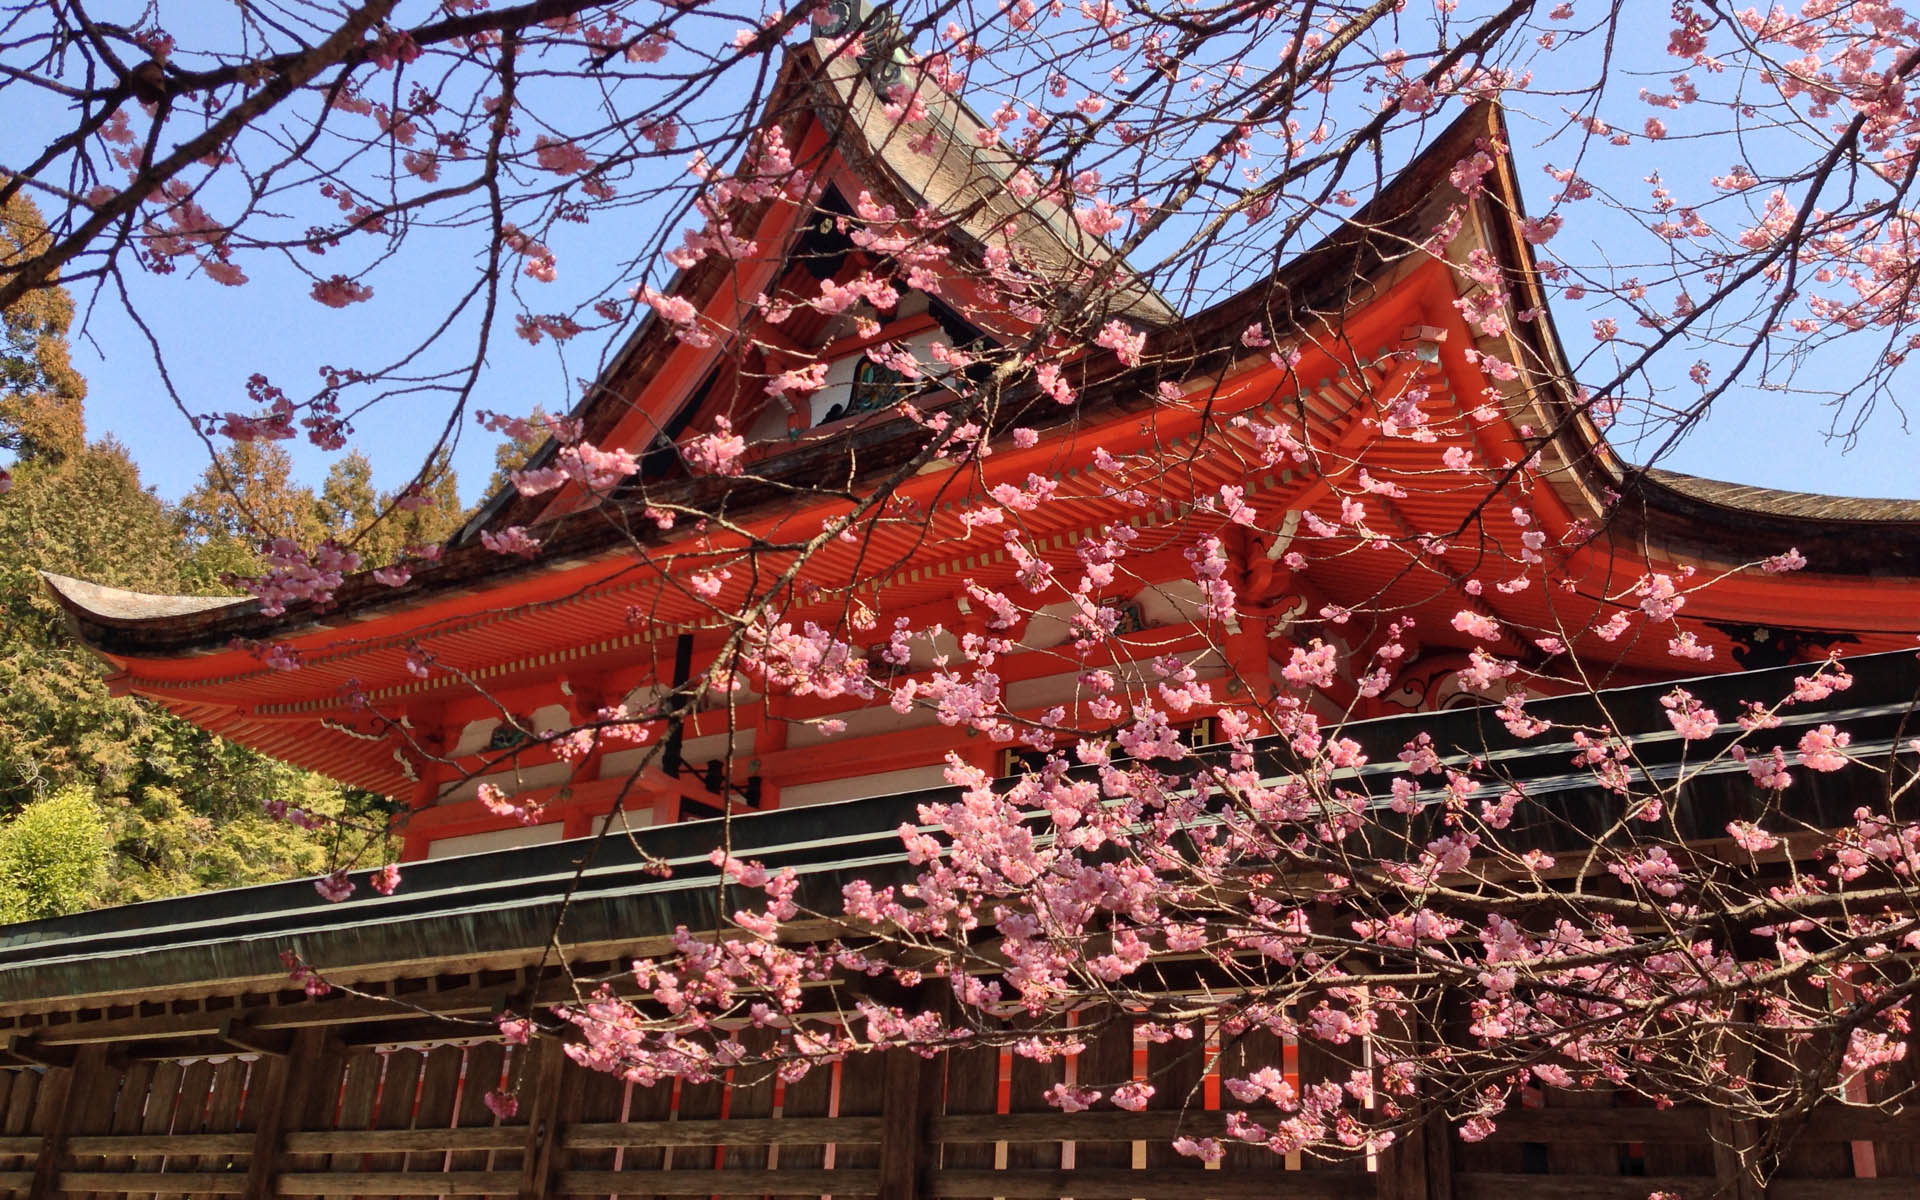 Kuil Jepun